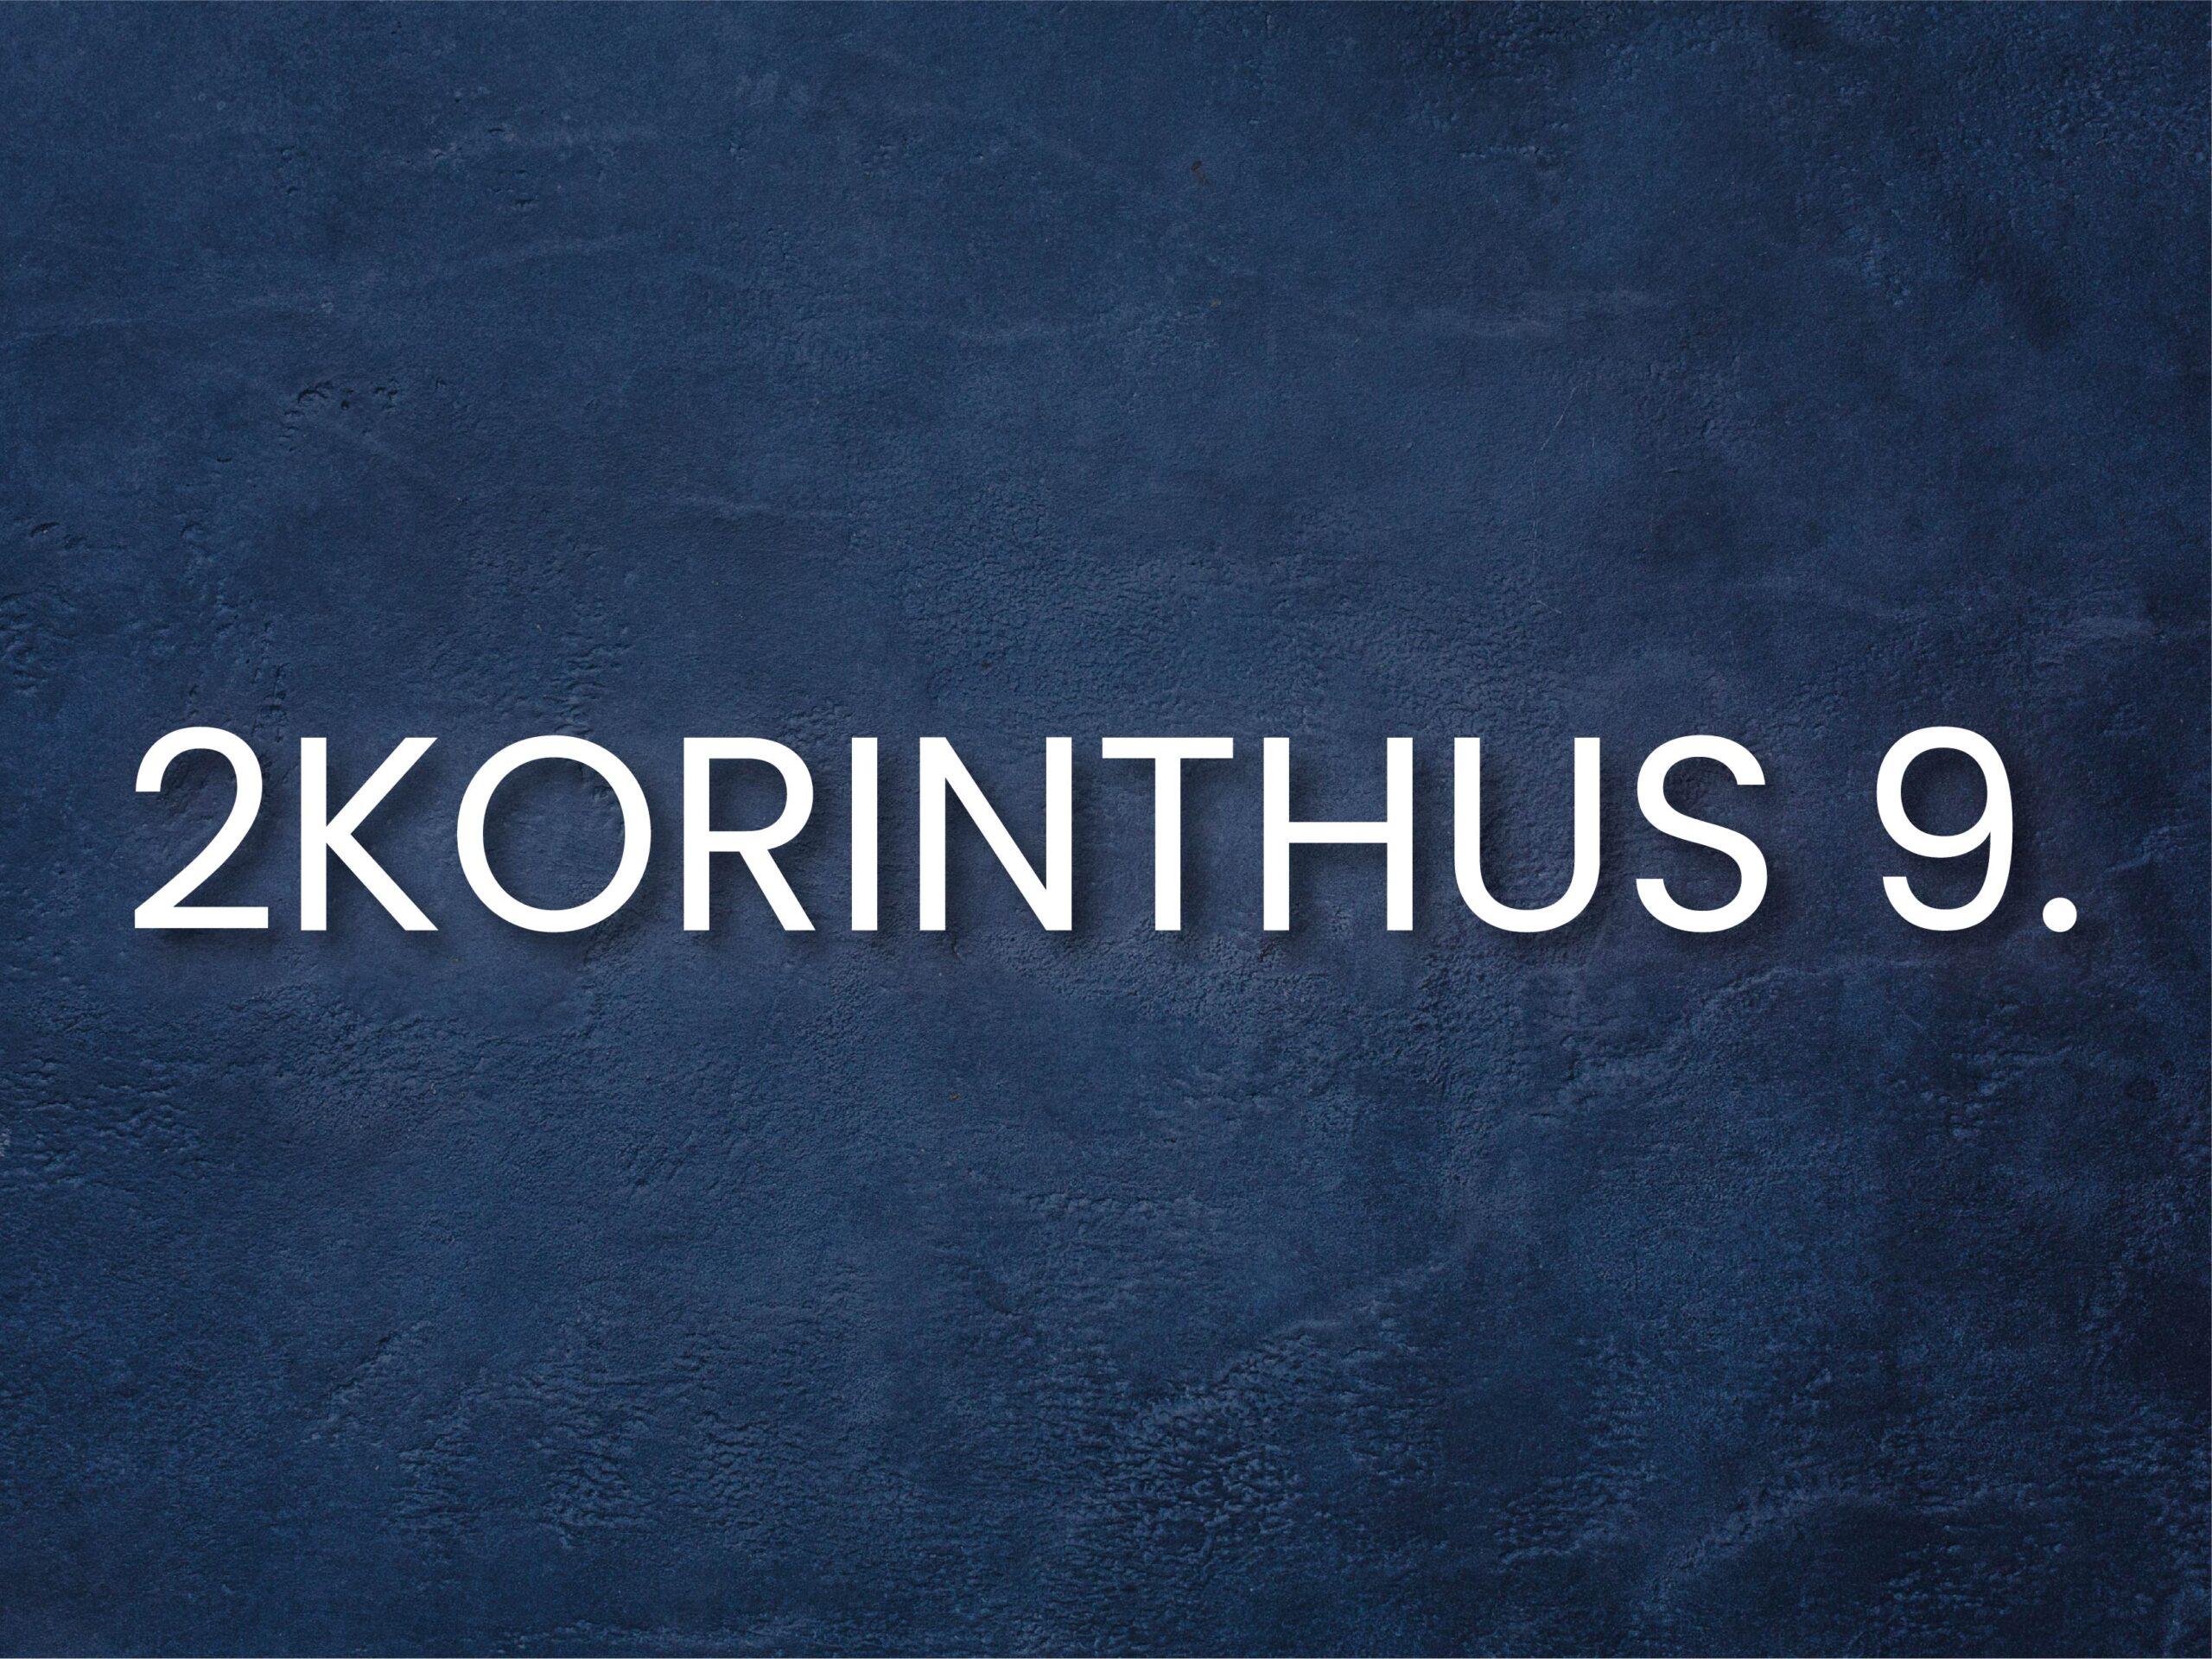 INFO_2korinthus_9